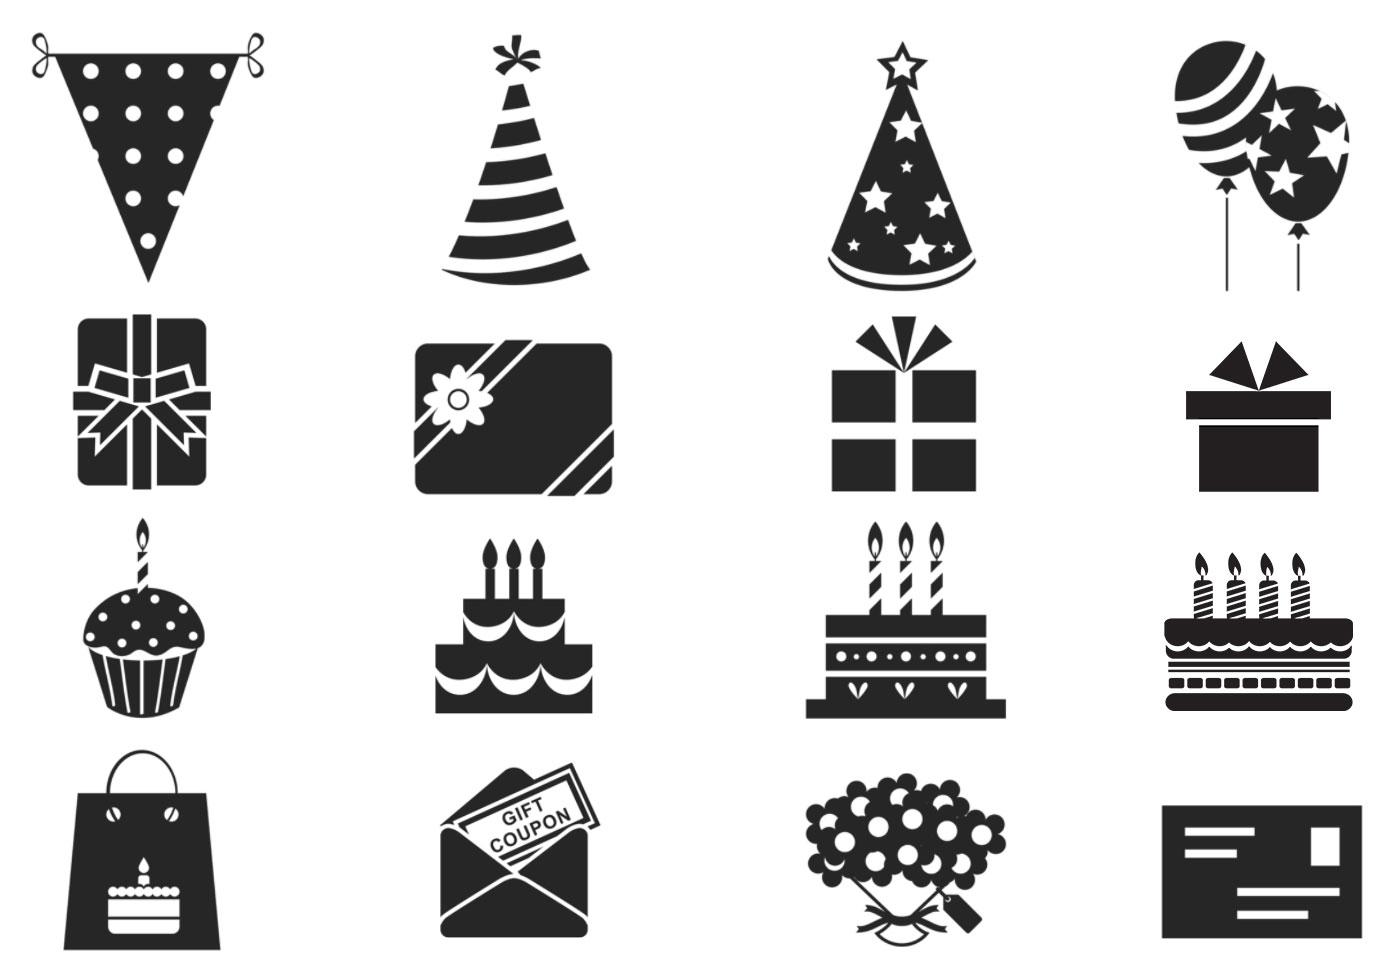 Birthday vector symbol pack download free vector art stock birthday vector symbol pack download free vector art stock graphics images biocorpaavc